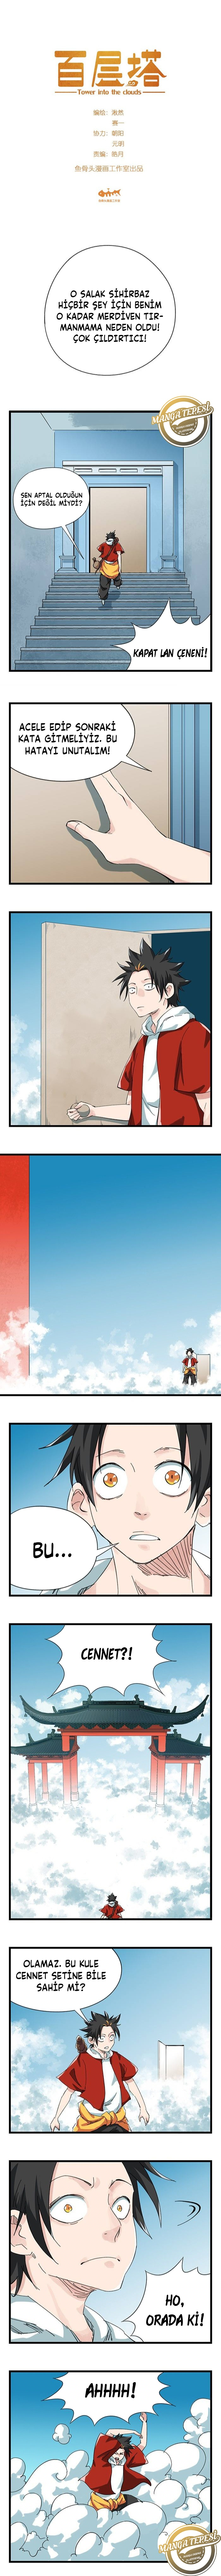 tower-into-the-cloudsbolum-25